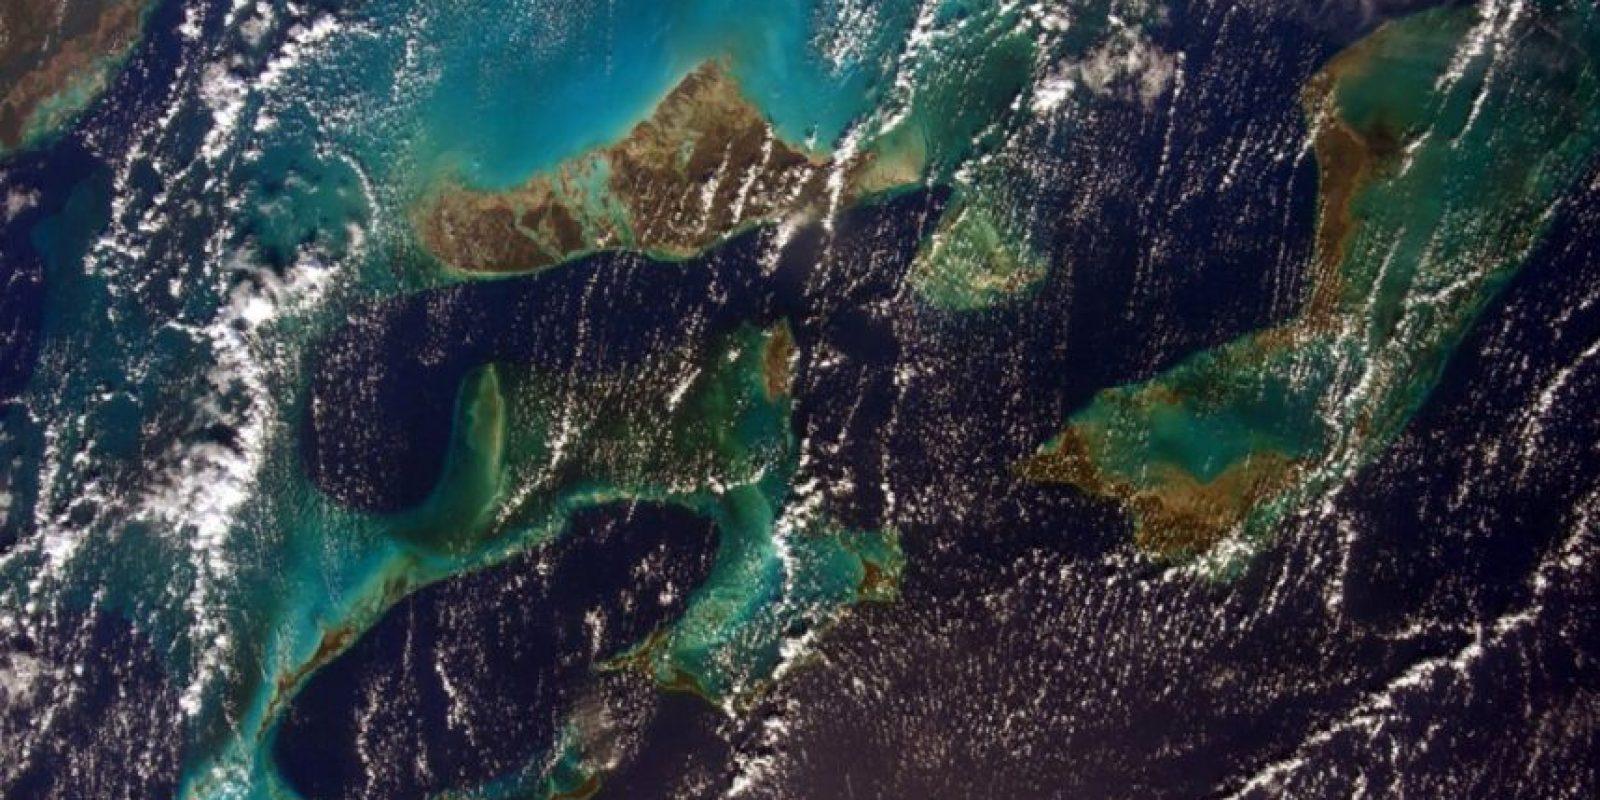 Antes de su regreso a la Tierra, la astronauta Sam Cristoforetti compartió una foto del Caribe. Foto:Vía Twitter @AstroSamantha